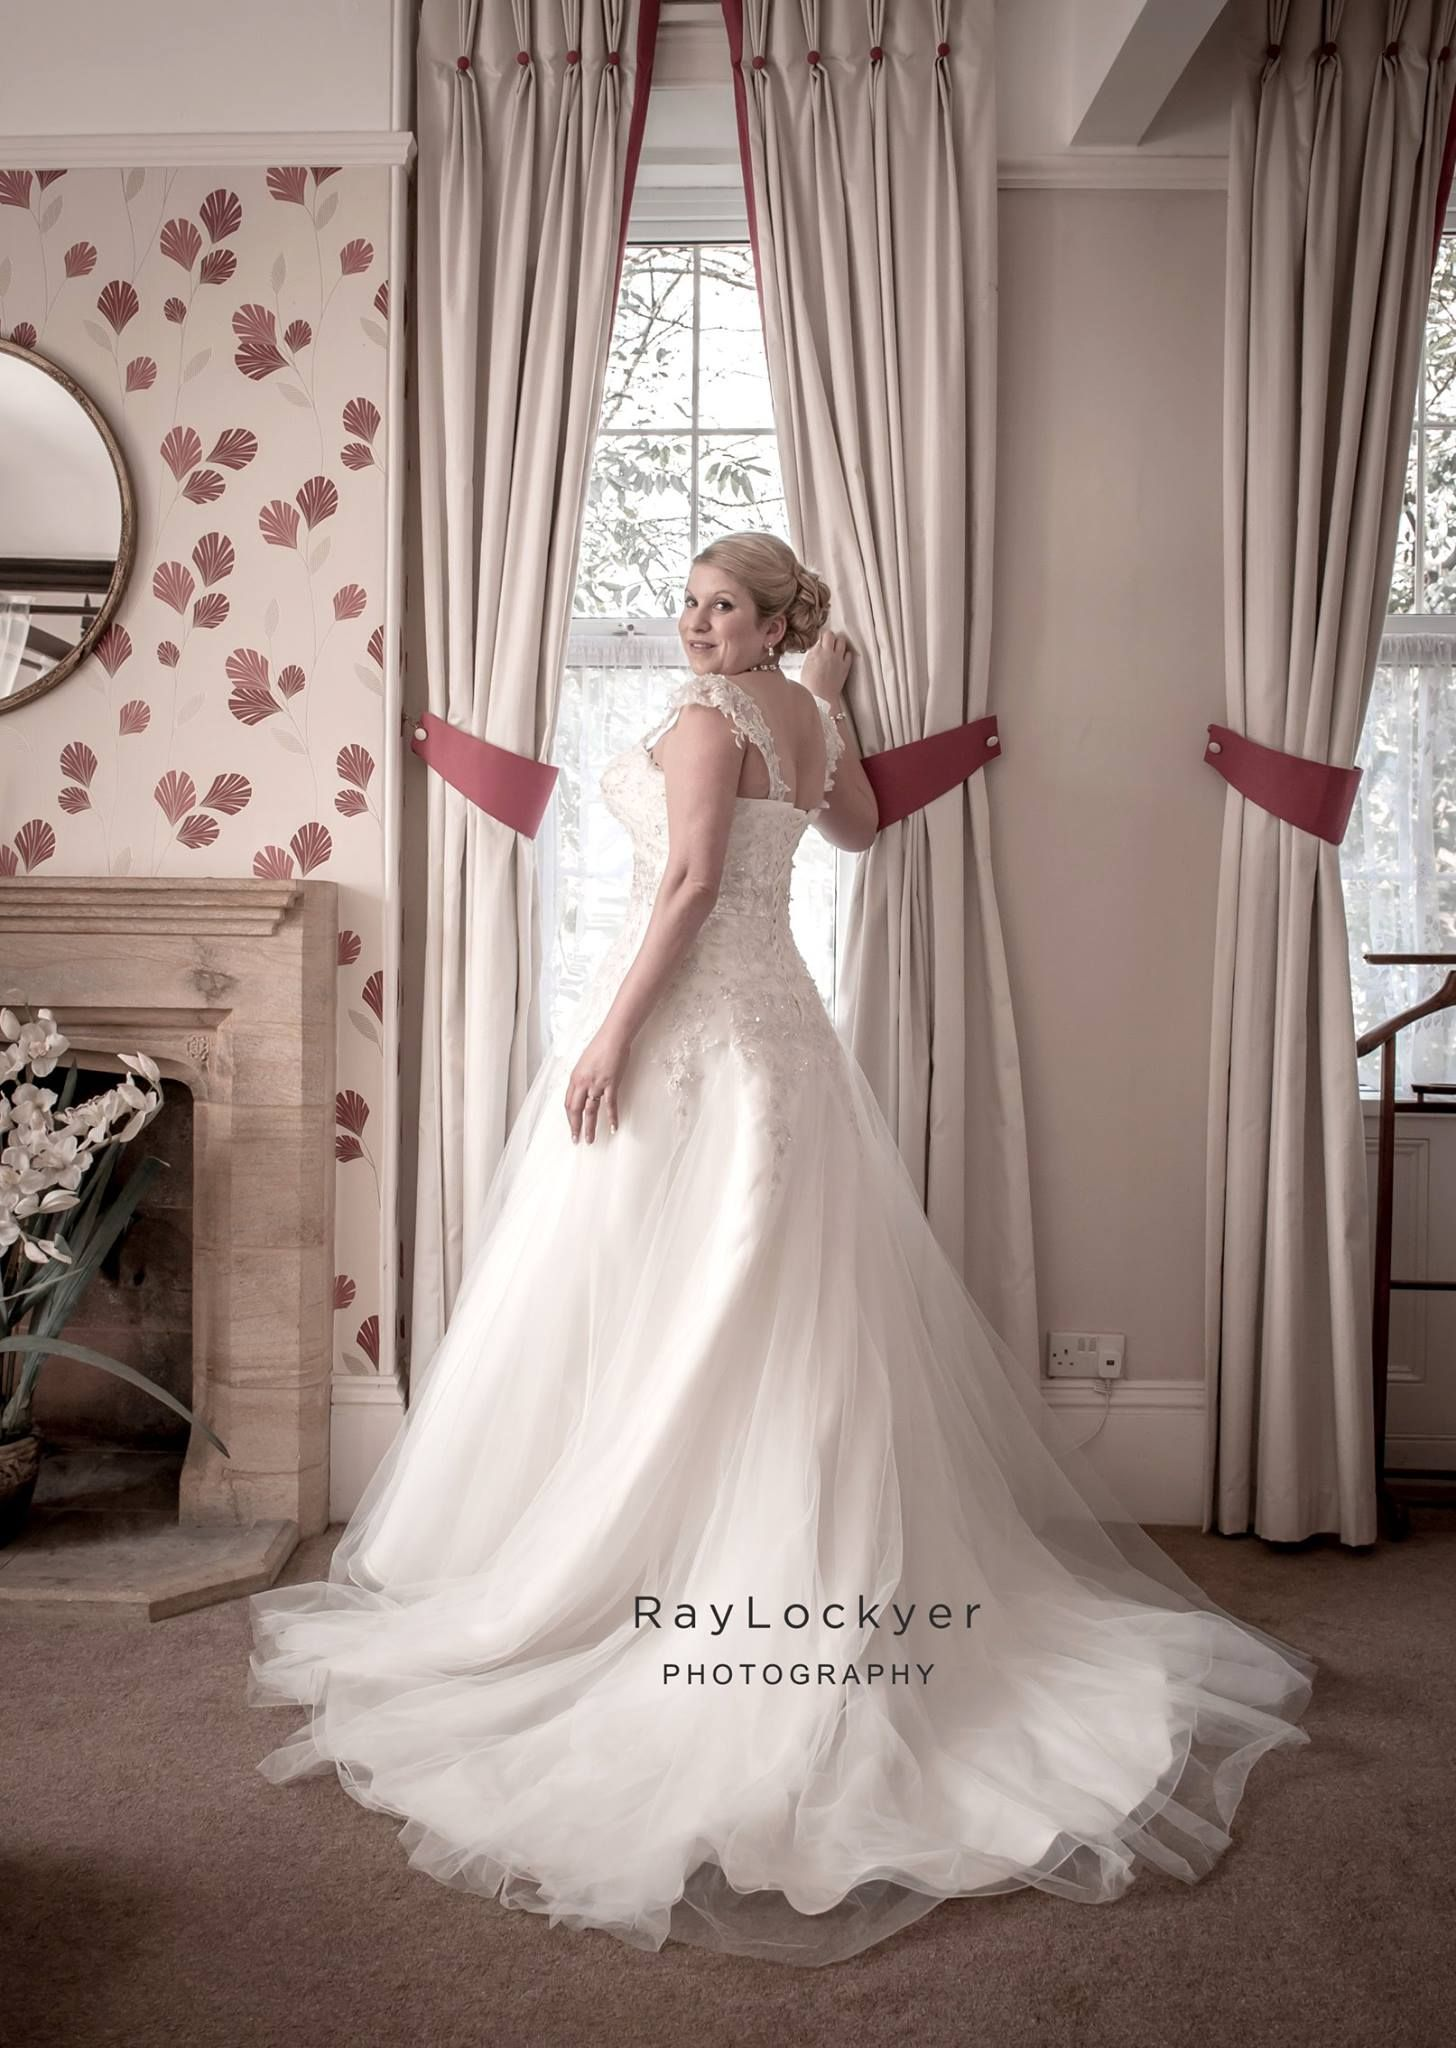 Ray Lockyer Yeovil Wedding Photographer - Bride during bridal ...